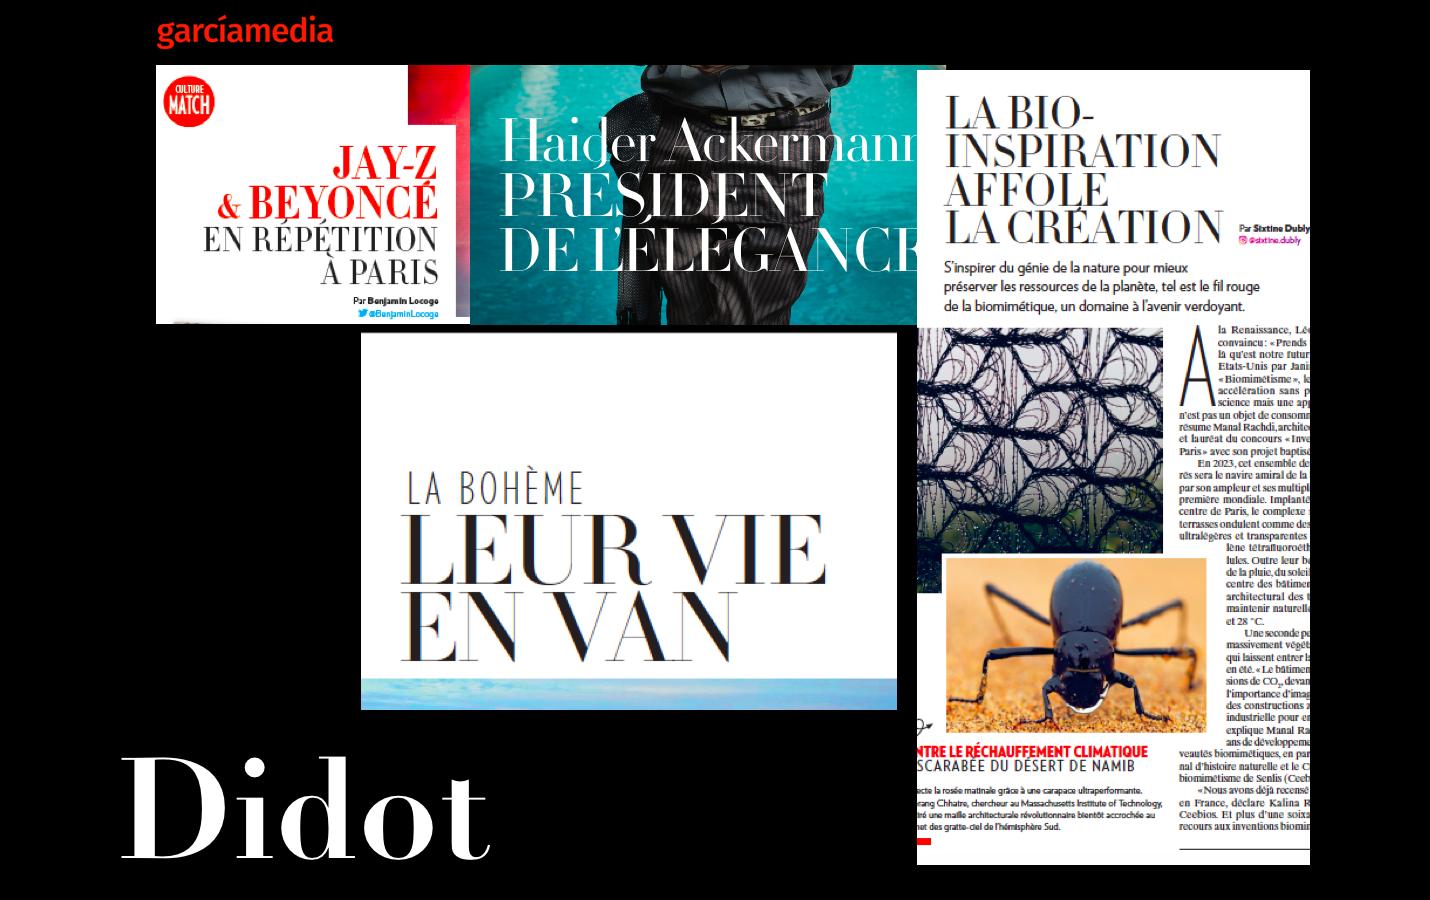 Paris Match: updating its design | García Media